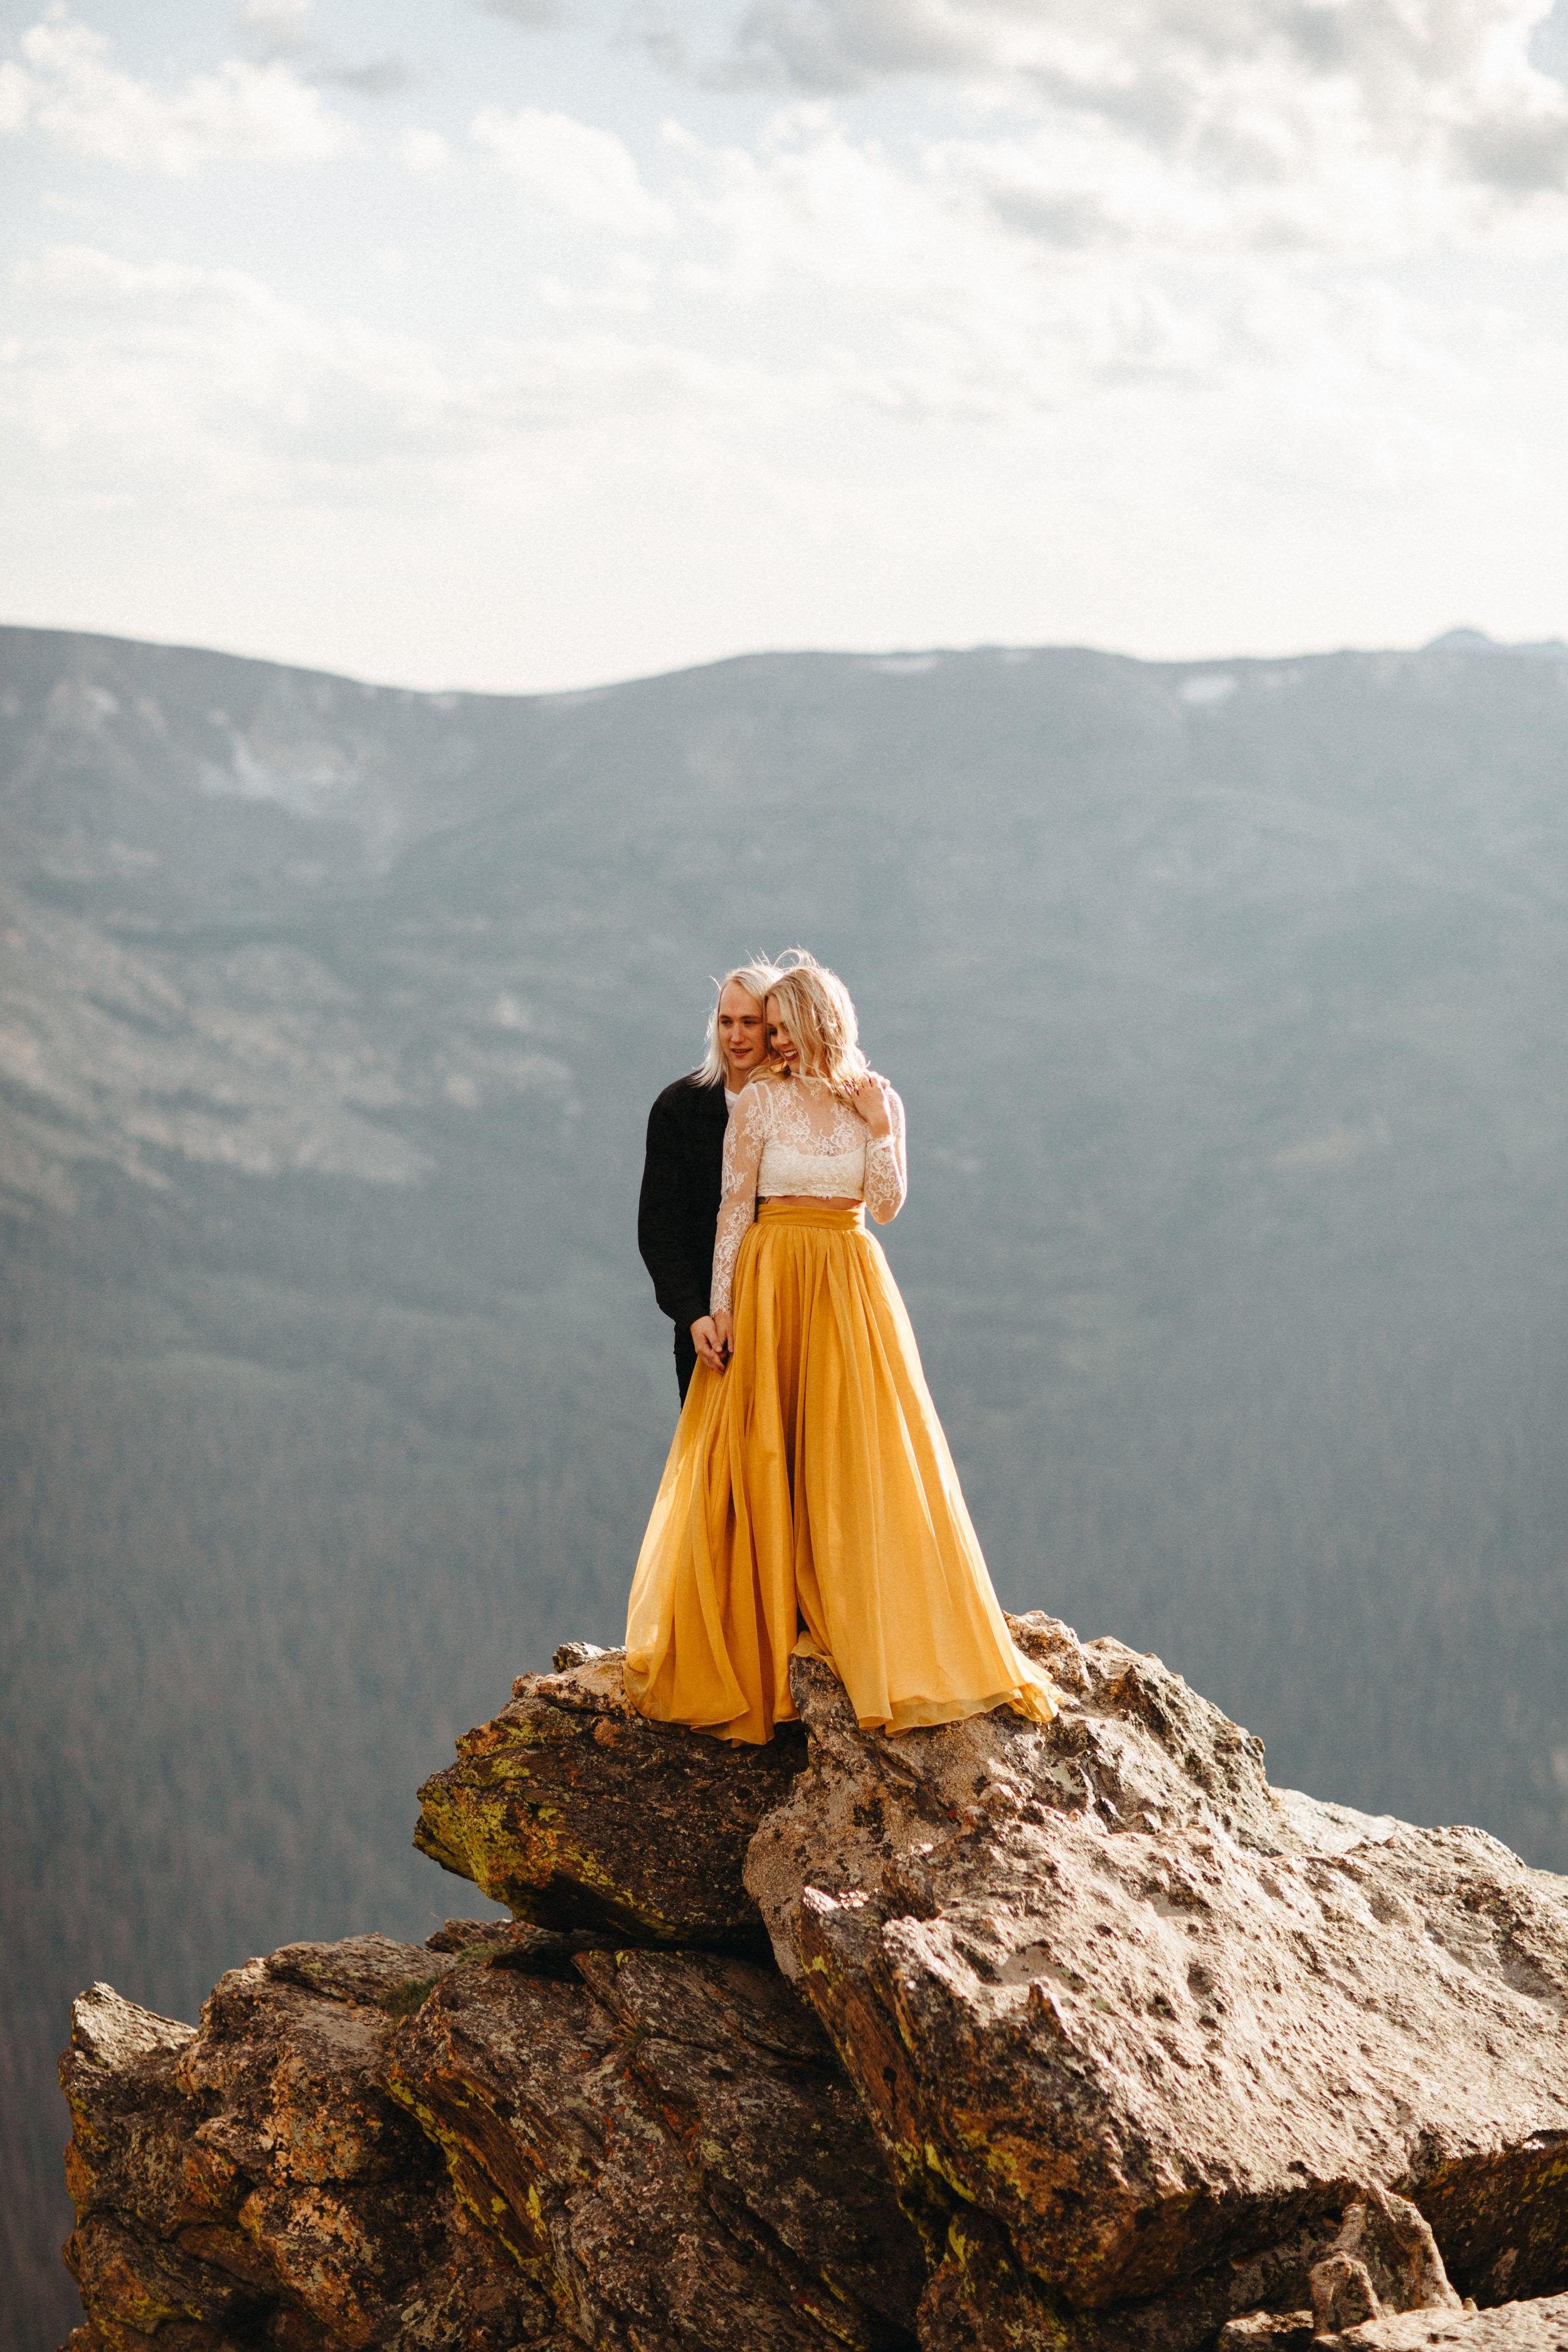 Liz Osban Photography Rocky Mountain National Park Trail Ridge Road Sweet Carolina Styles Skirt Marigold Yellow Cole Janzen Kelli Mantooth Mountains Colorado Northern Estes Park Alpine Elopement Wedding Destination Adventure LBGT Engaged33.jpg